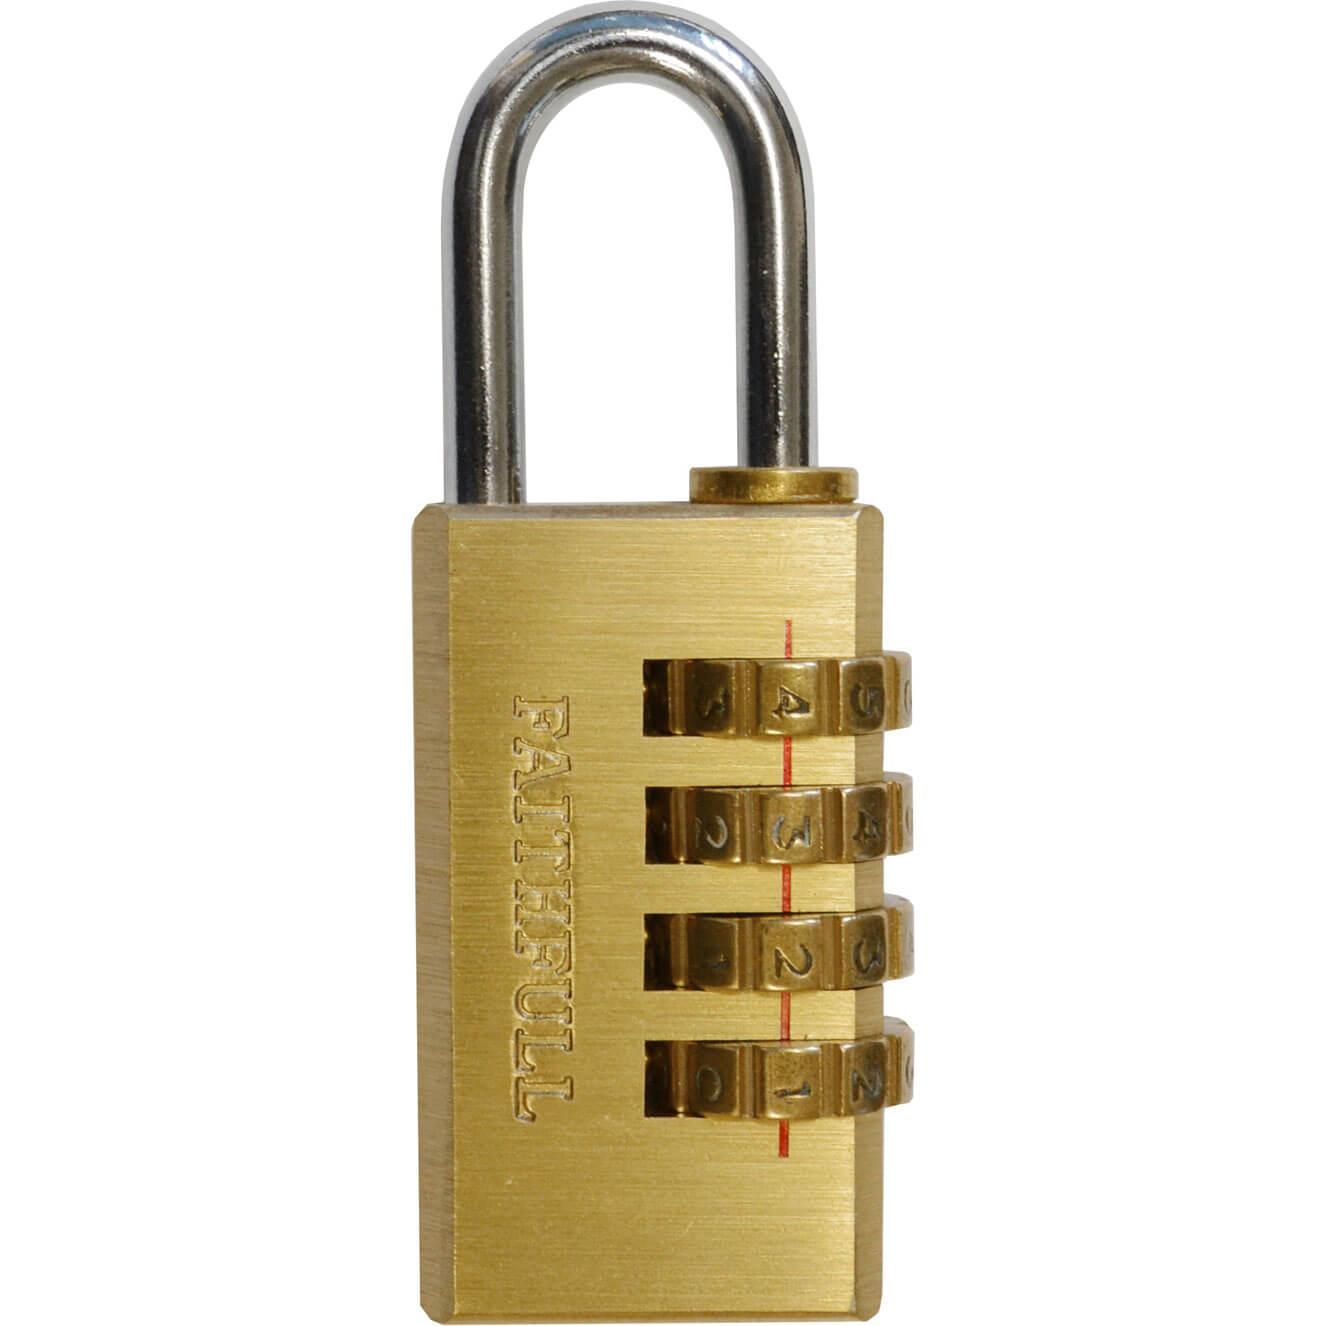 Tooled Up/Ironmongery & Security/Security/Faithfull 20mm 4 Digit Brass Combination Padlock